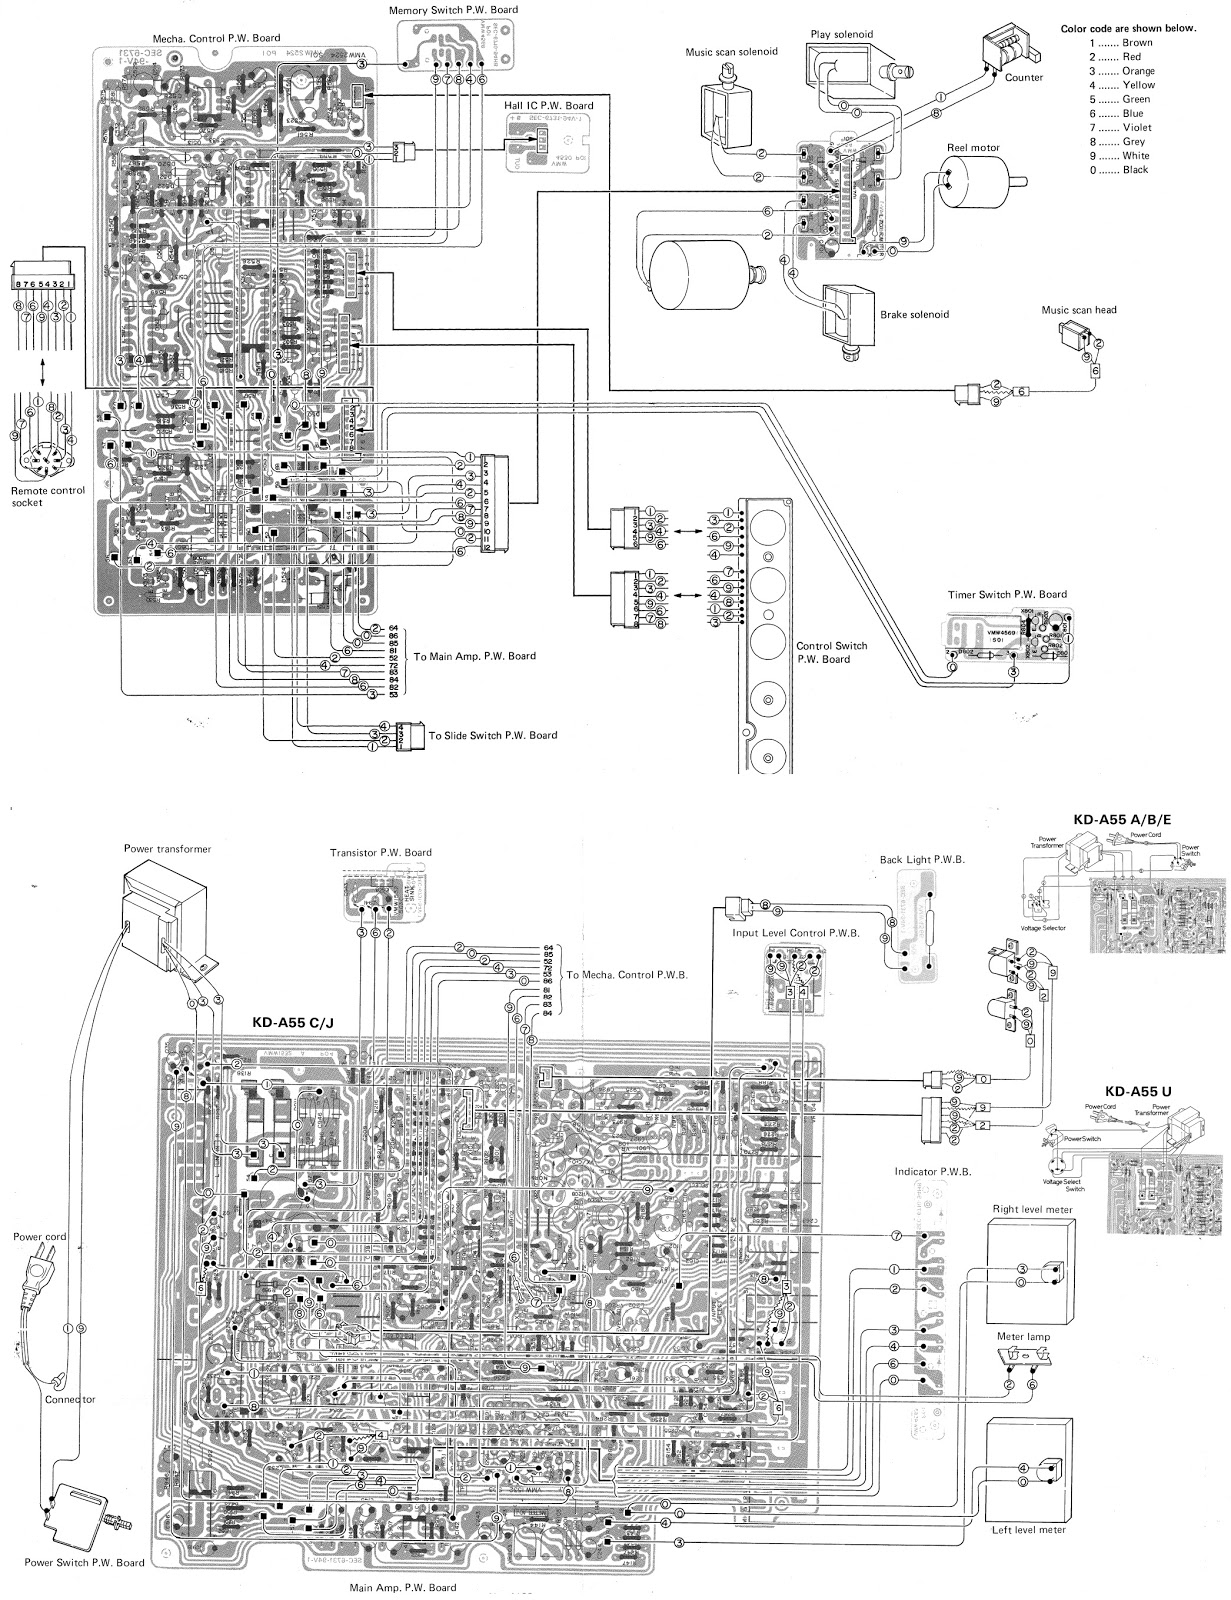 jvc deck wiring diagram 19 sg dbd de u2022jvc kd a55 gradient cd6500 tape deck [ 1231 x 1600 Pixel ]